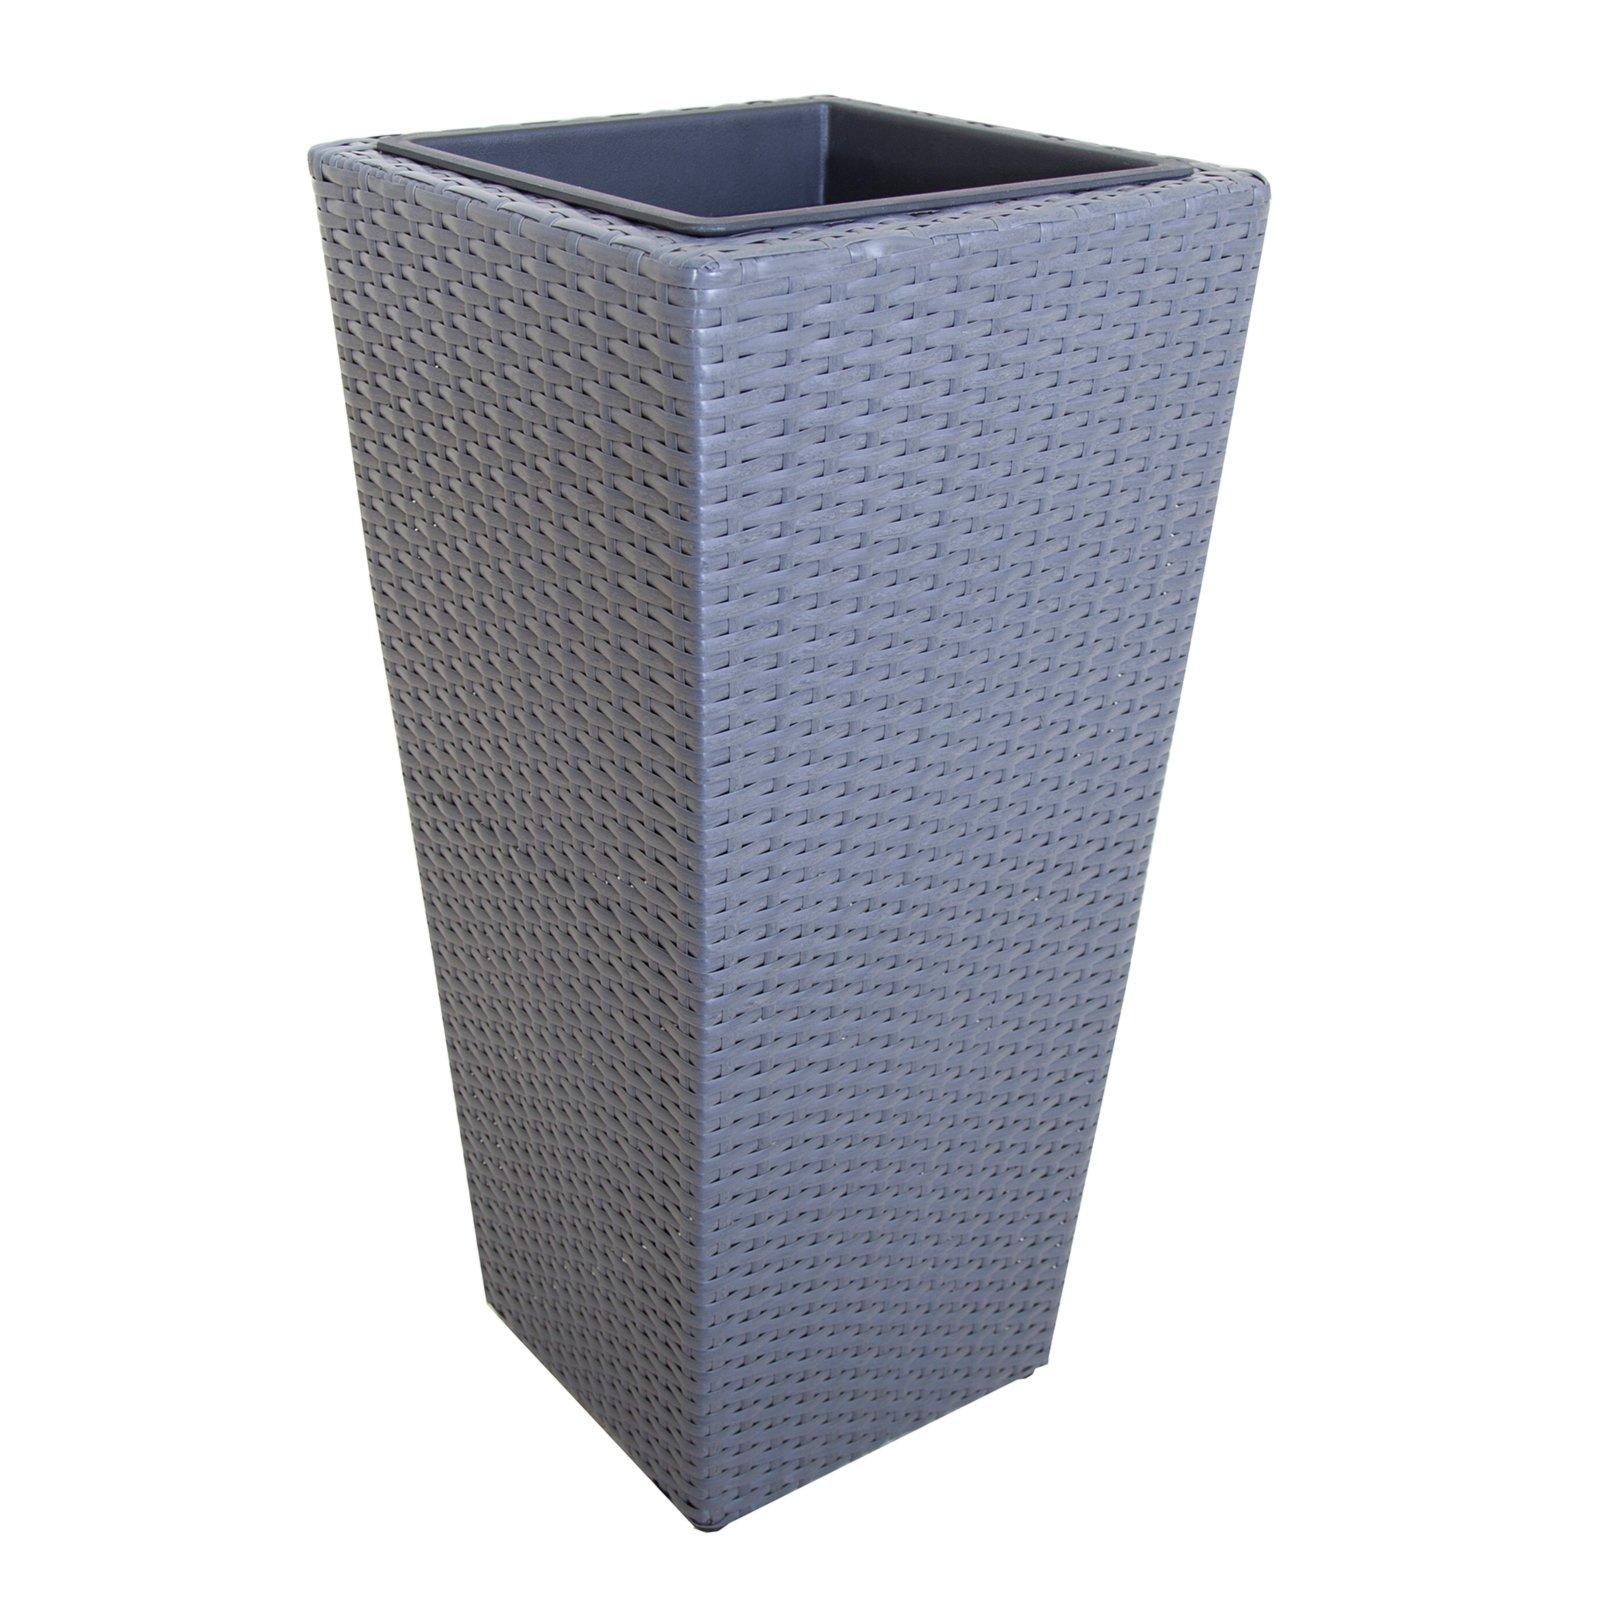 pflanzk bel betongrau rattan optik 64 cm. Black Bedroom Furniture Sets. Home Design Ideas